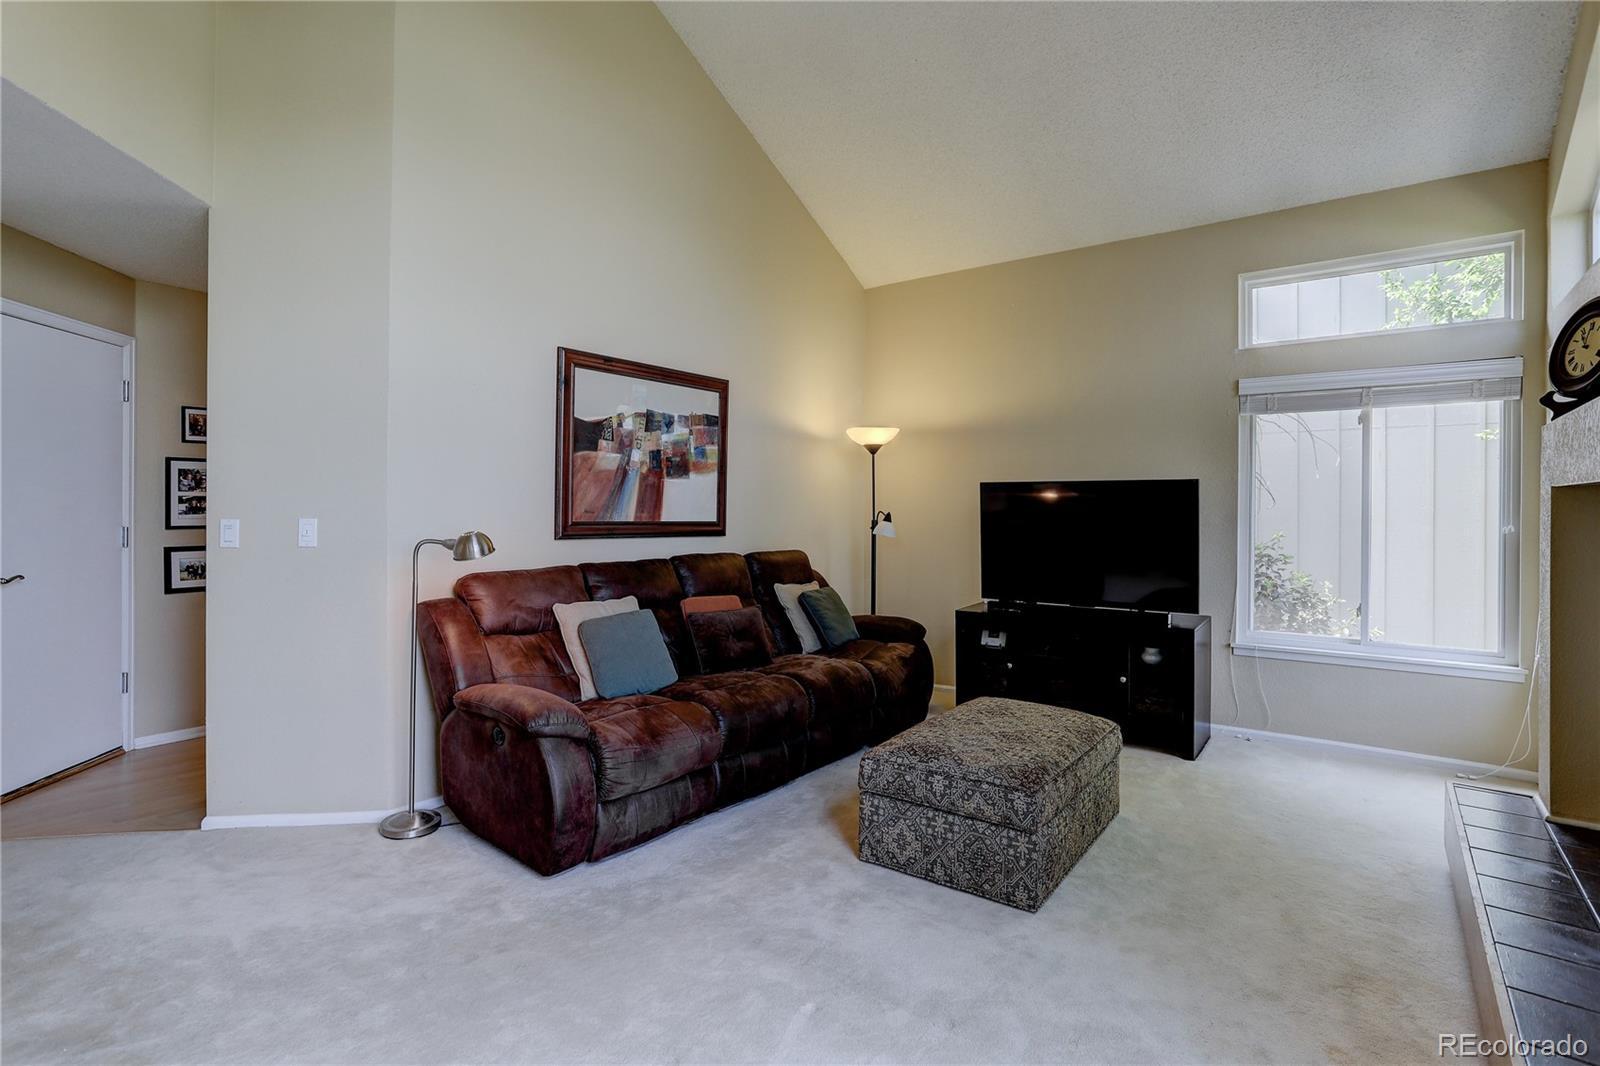 MLS# 9389187 - 15 - 1245 Goldsmith Drive, Highlands Ranch, CO 80126